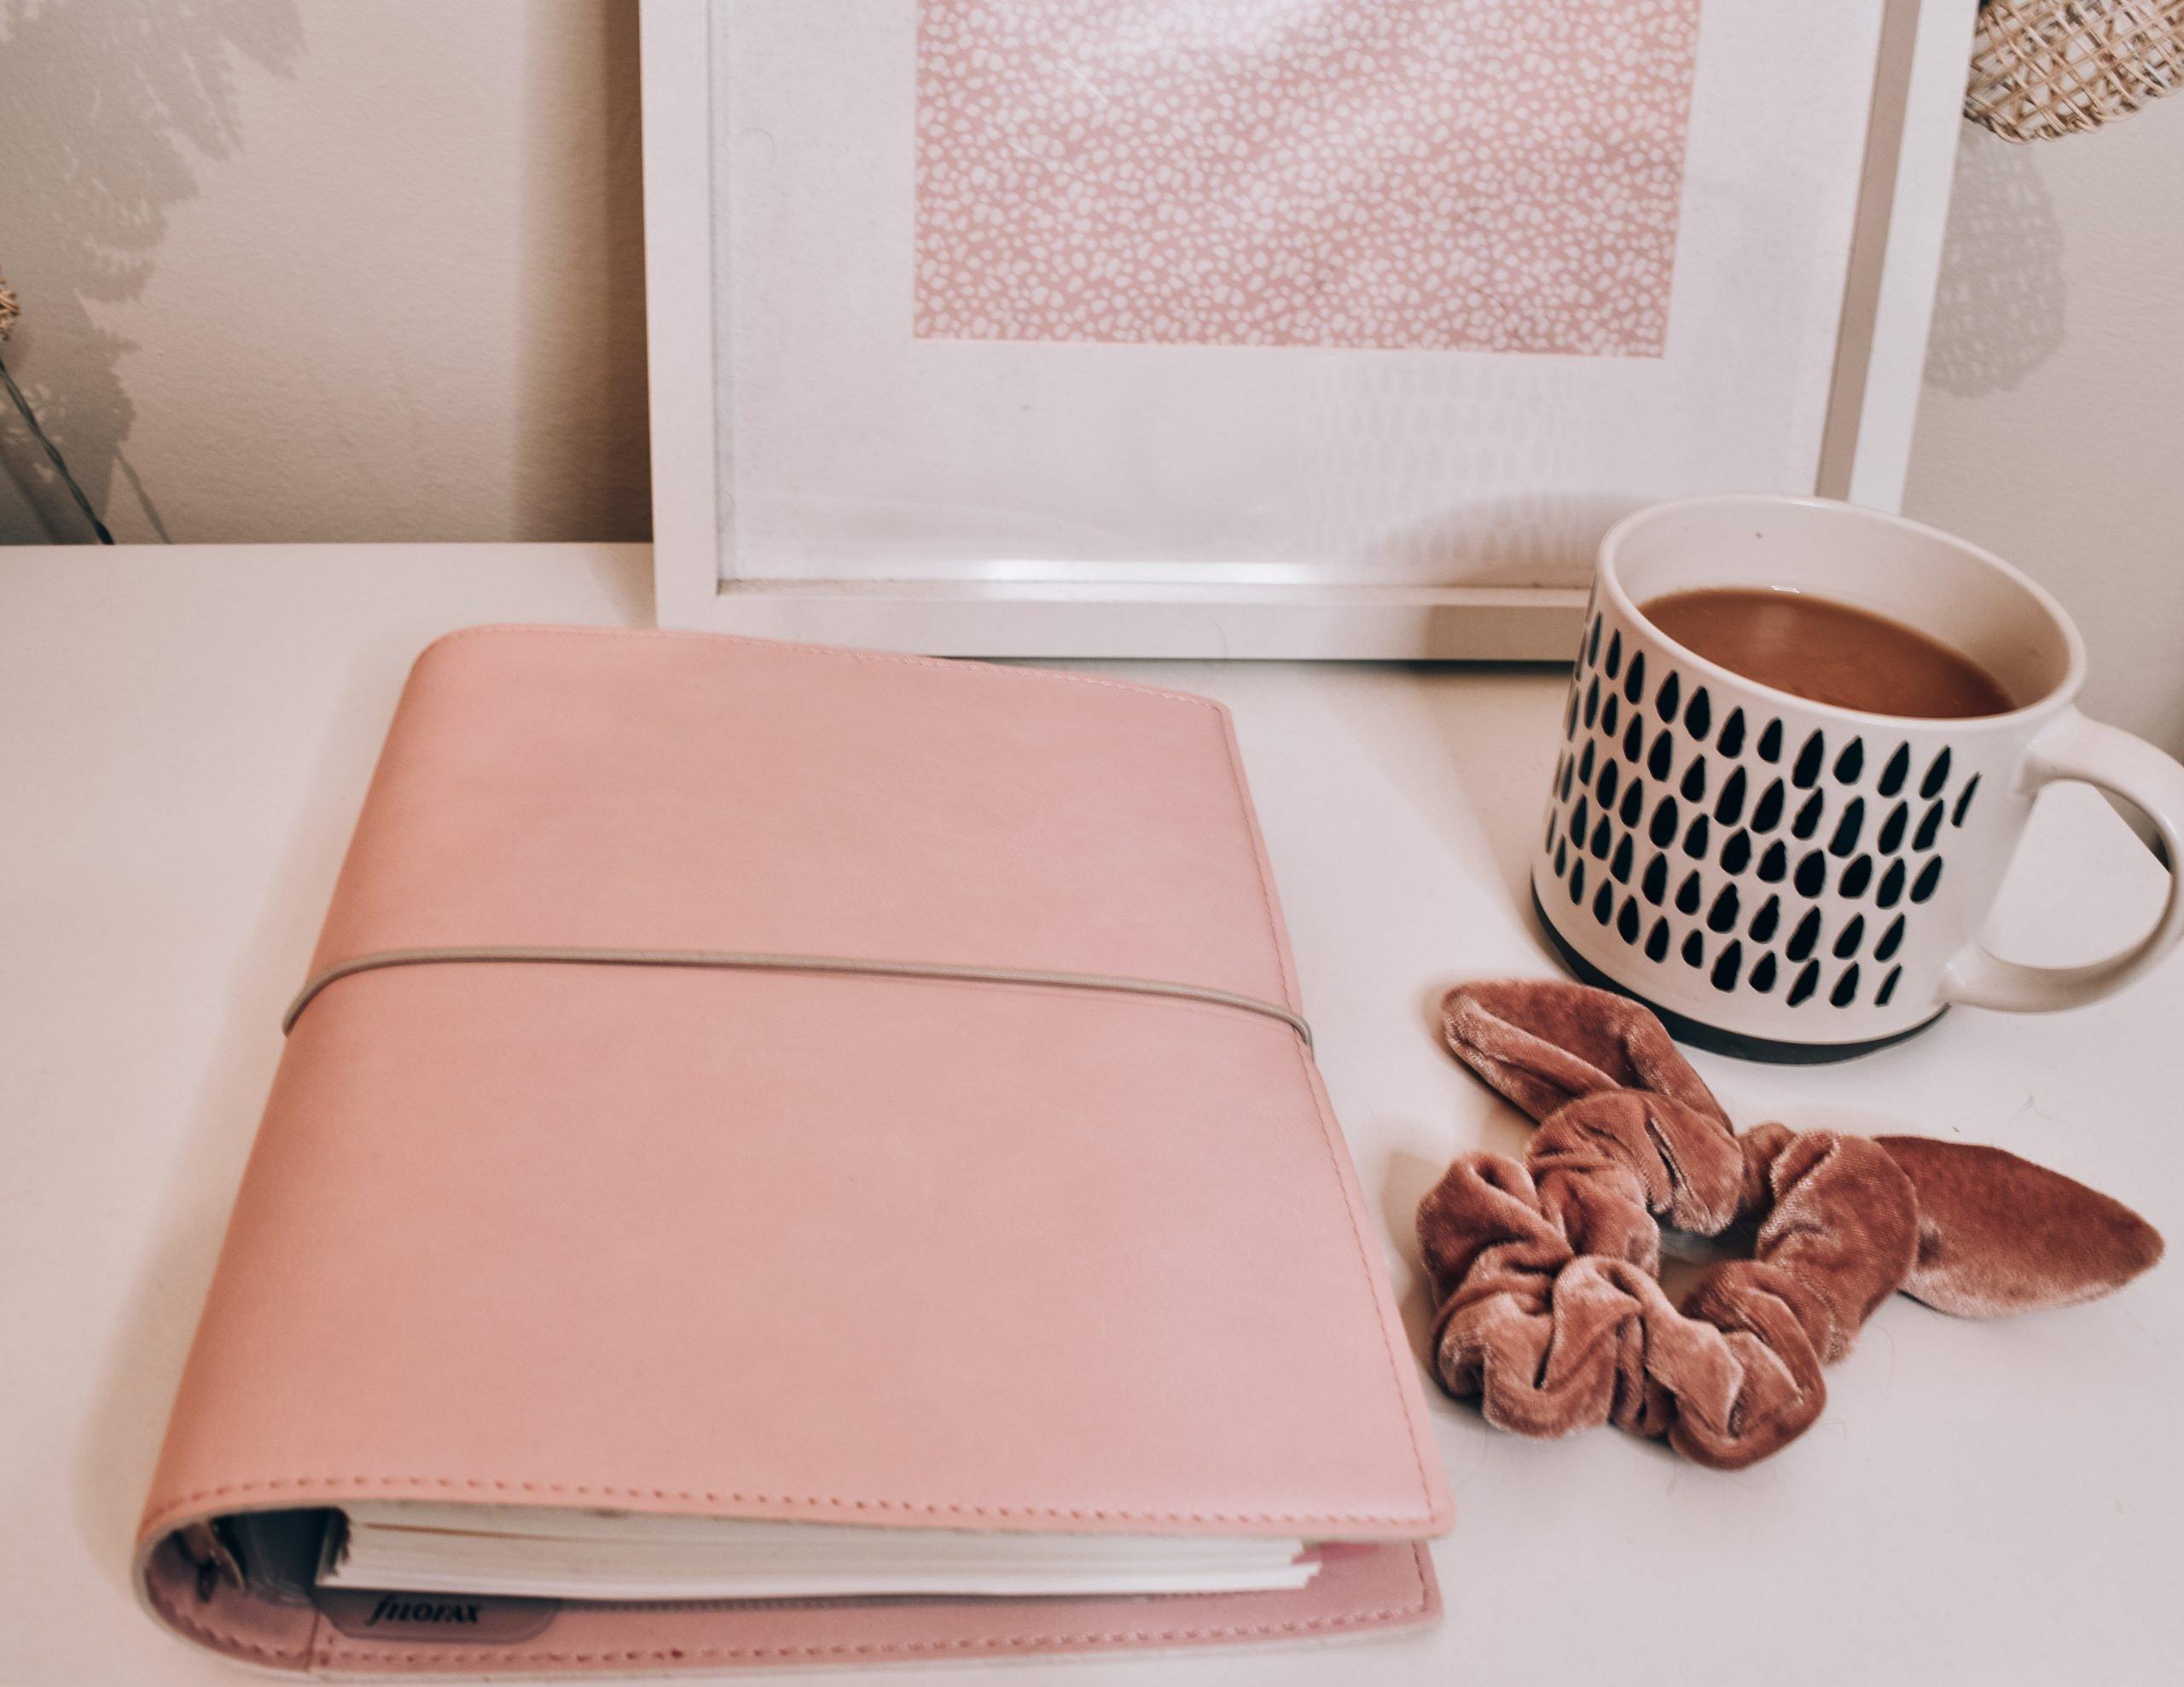 5 Ways To Get More Organised